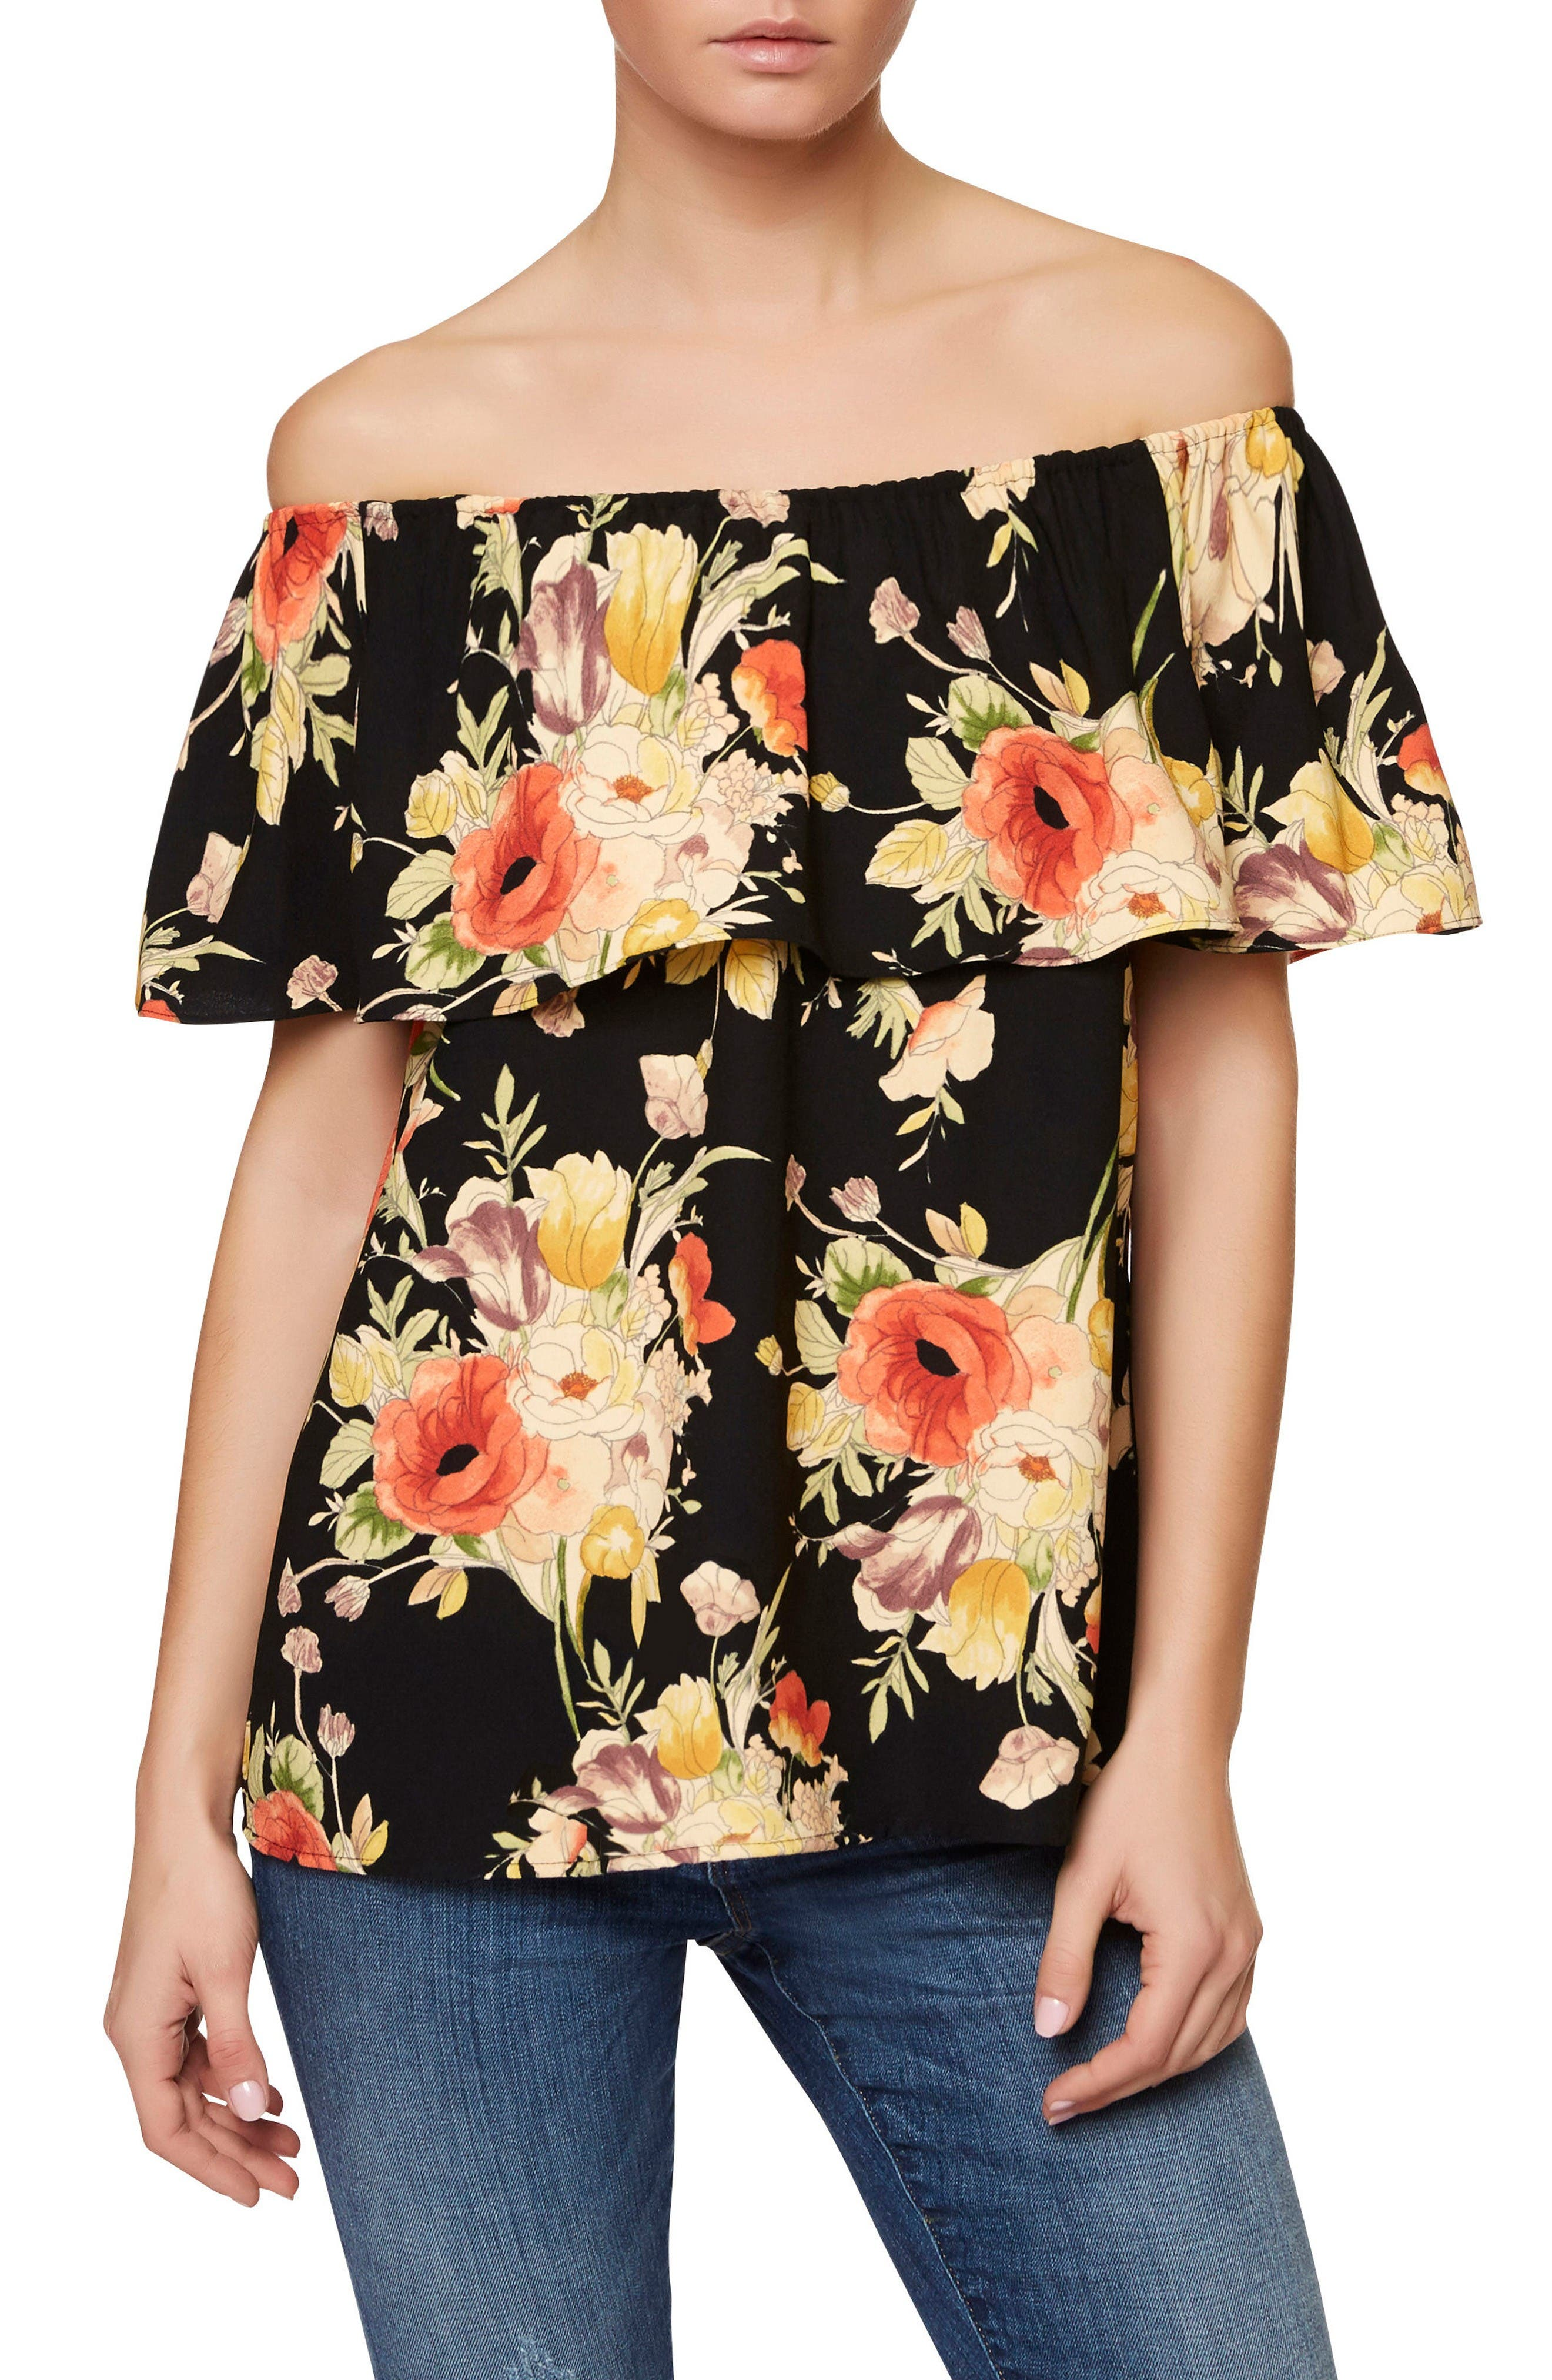 Alternate Image 1 Selected - Sanctuary Misha Off the Shoulder Floral Top